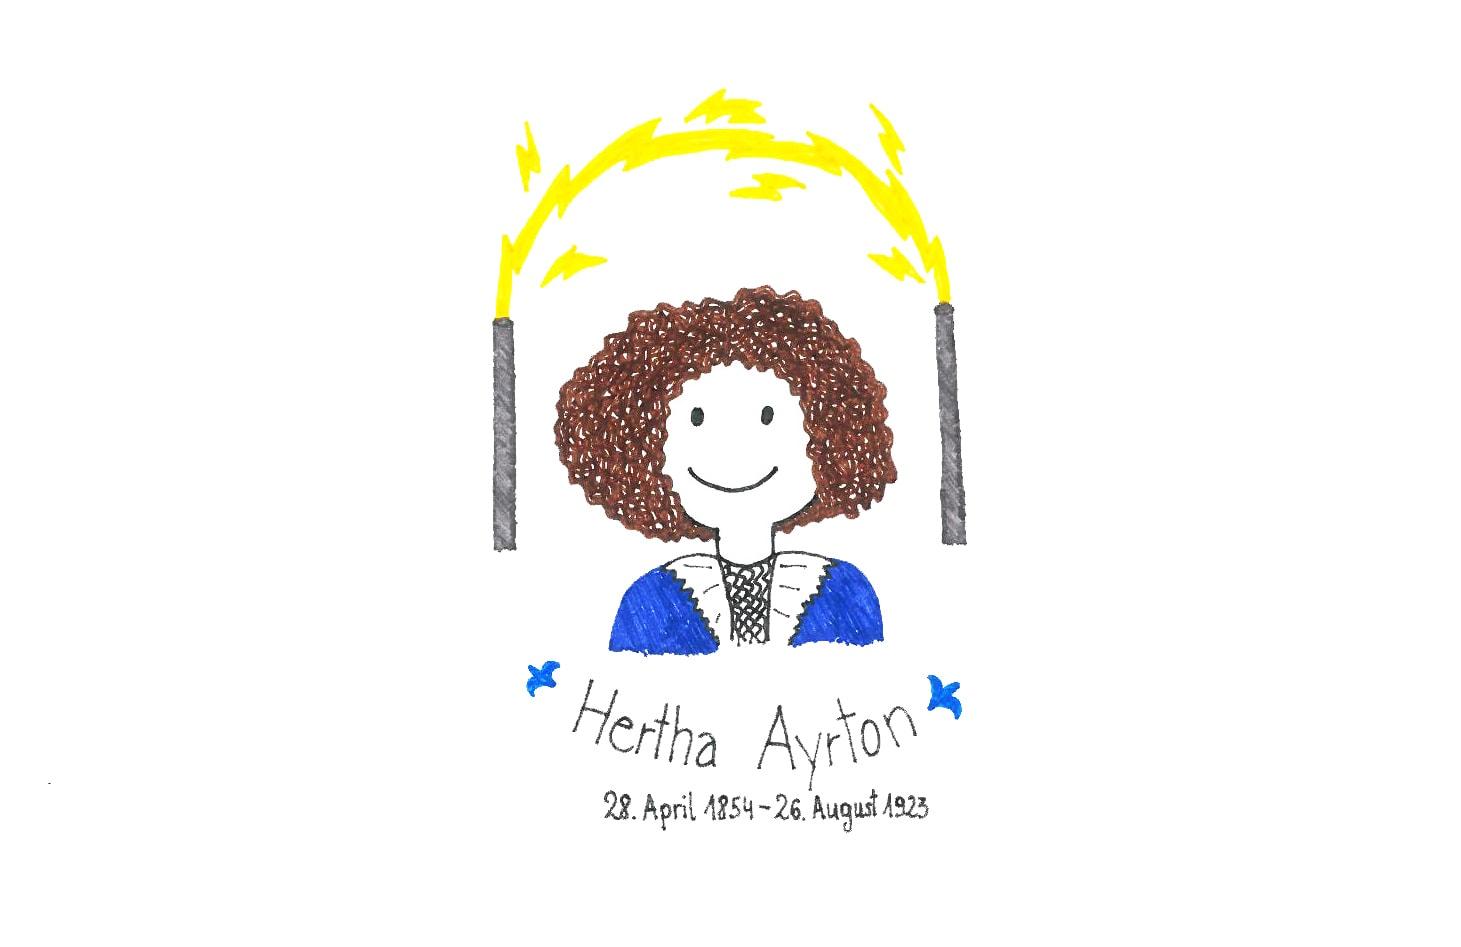 Illustration von Hertha Ayrton